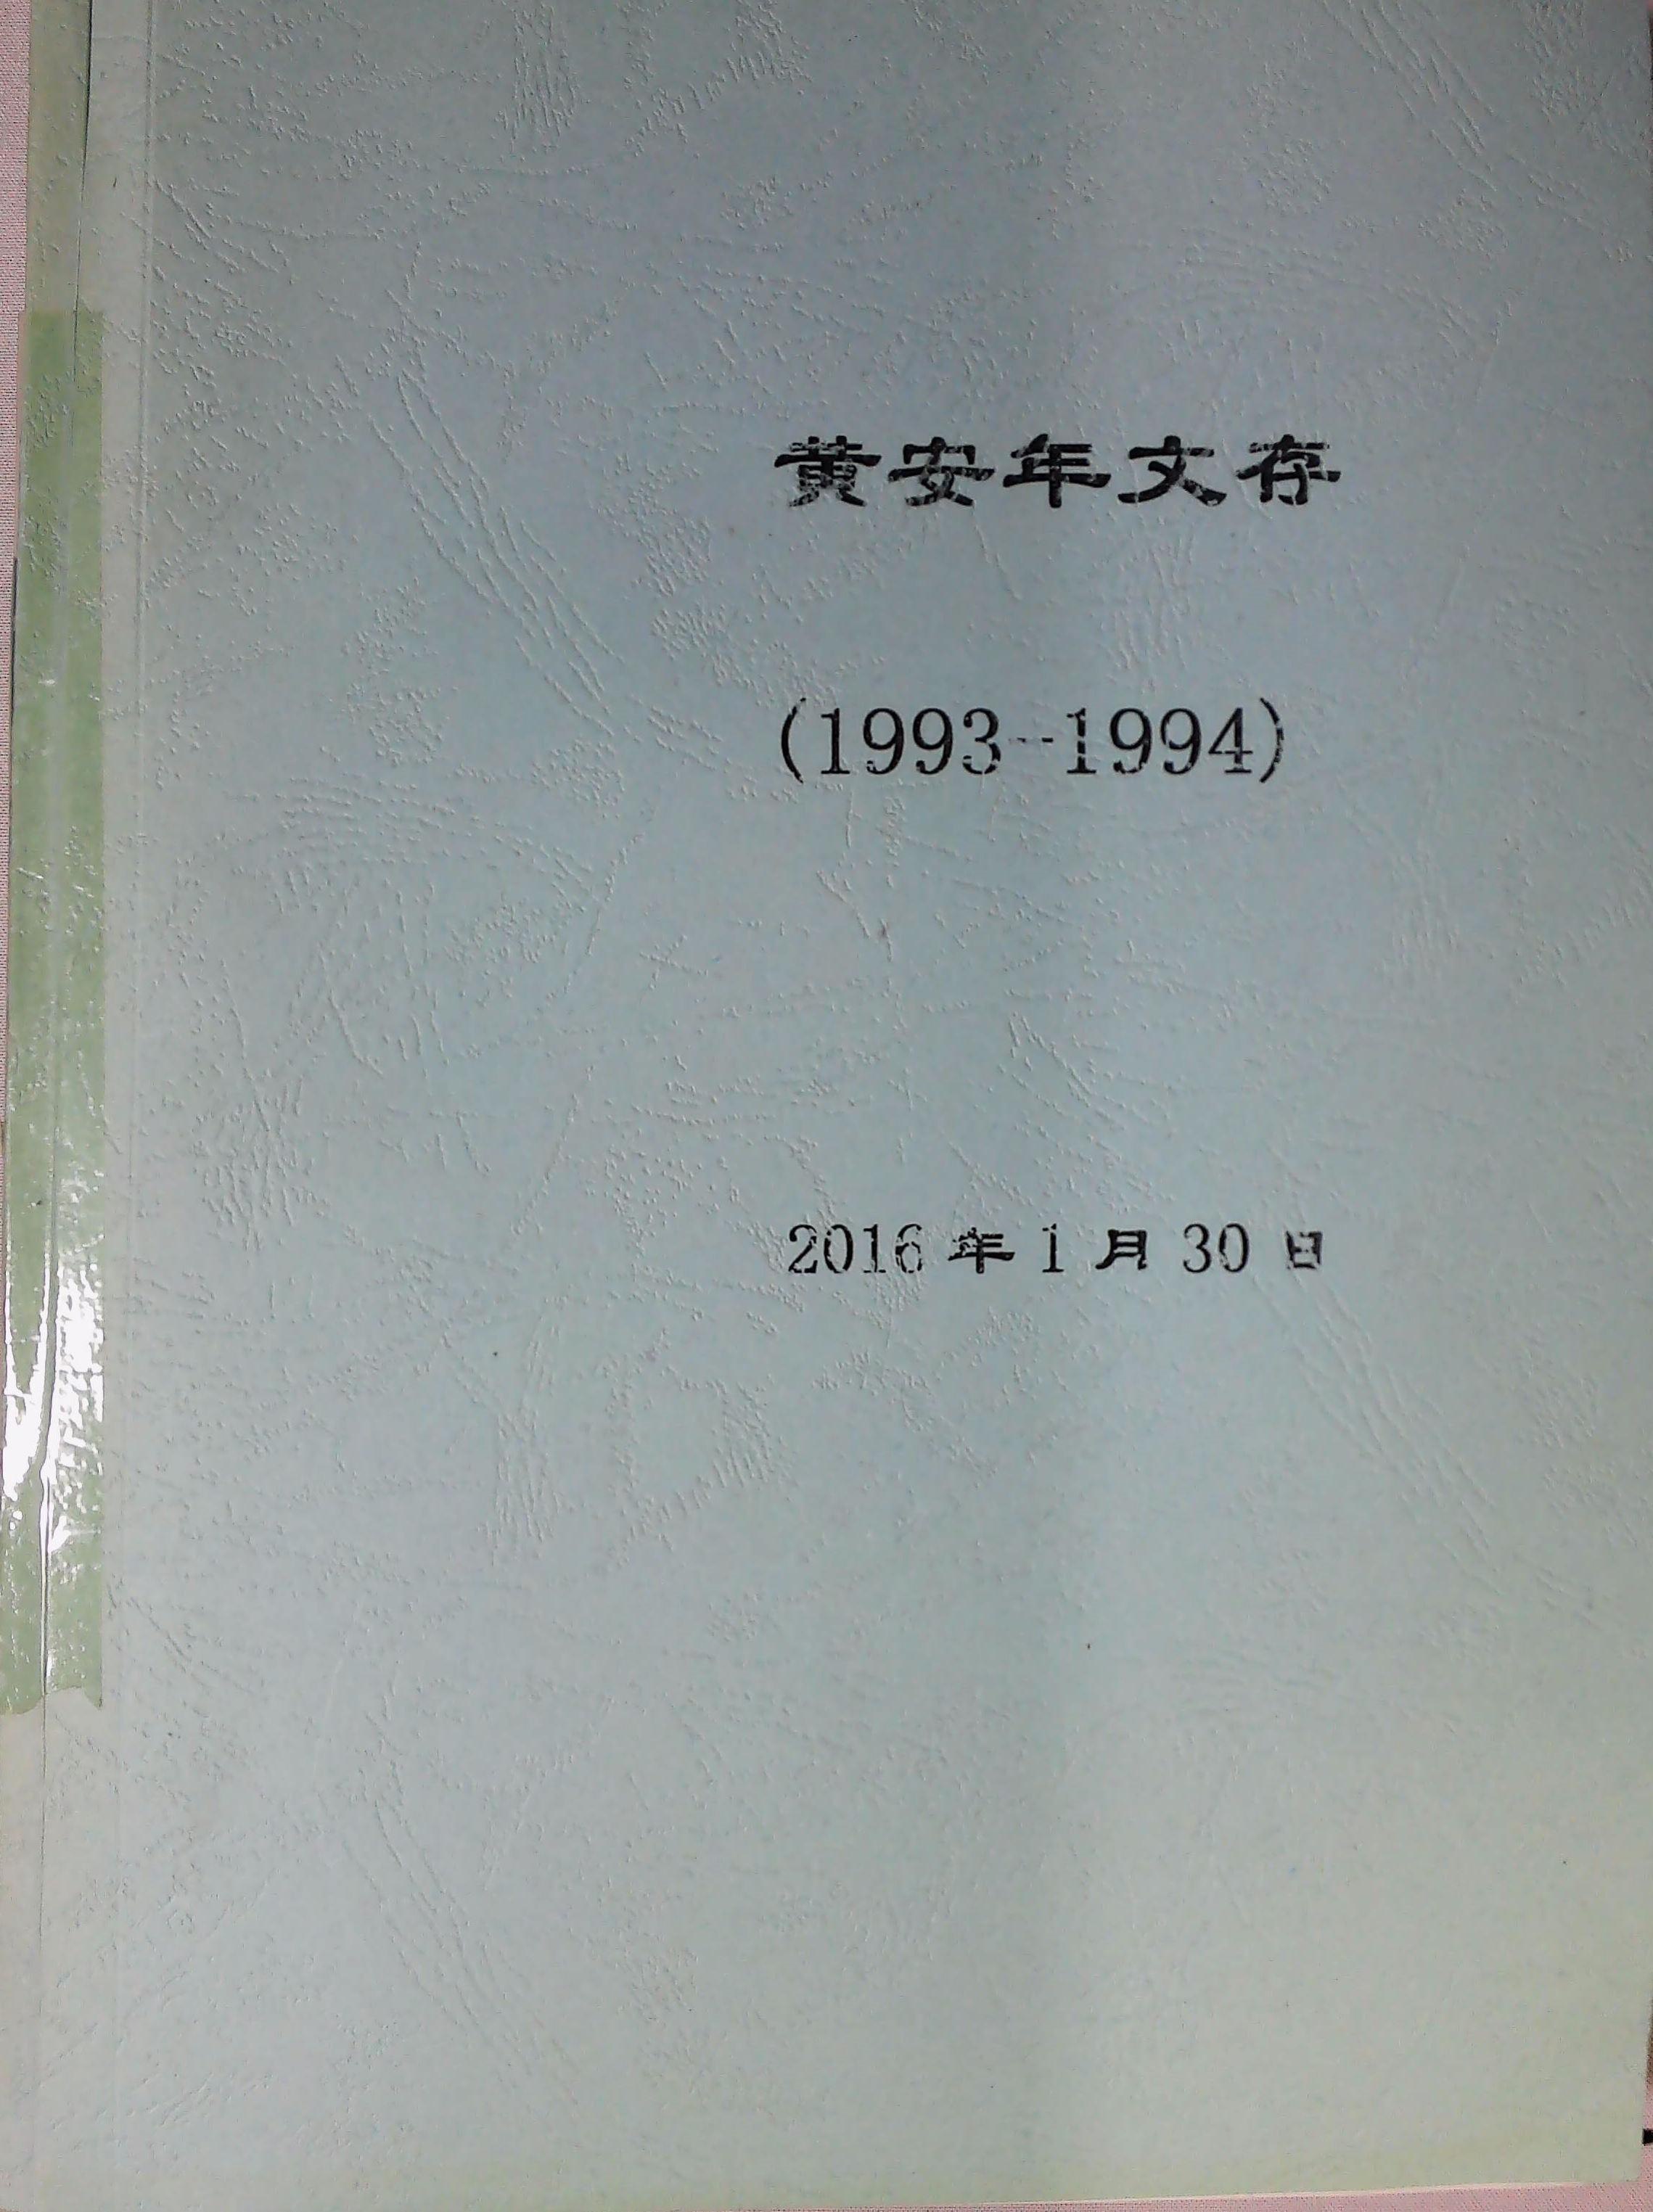 1 IMG1261.jpg